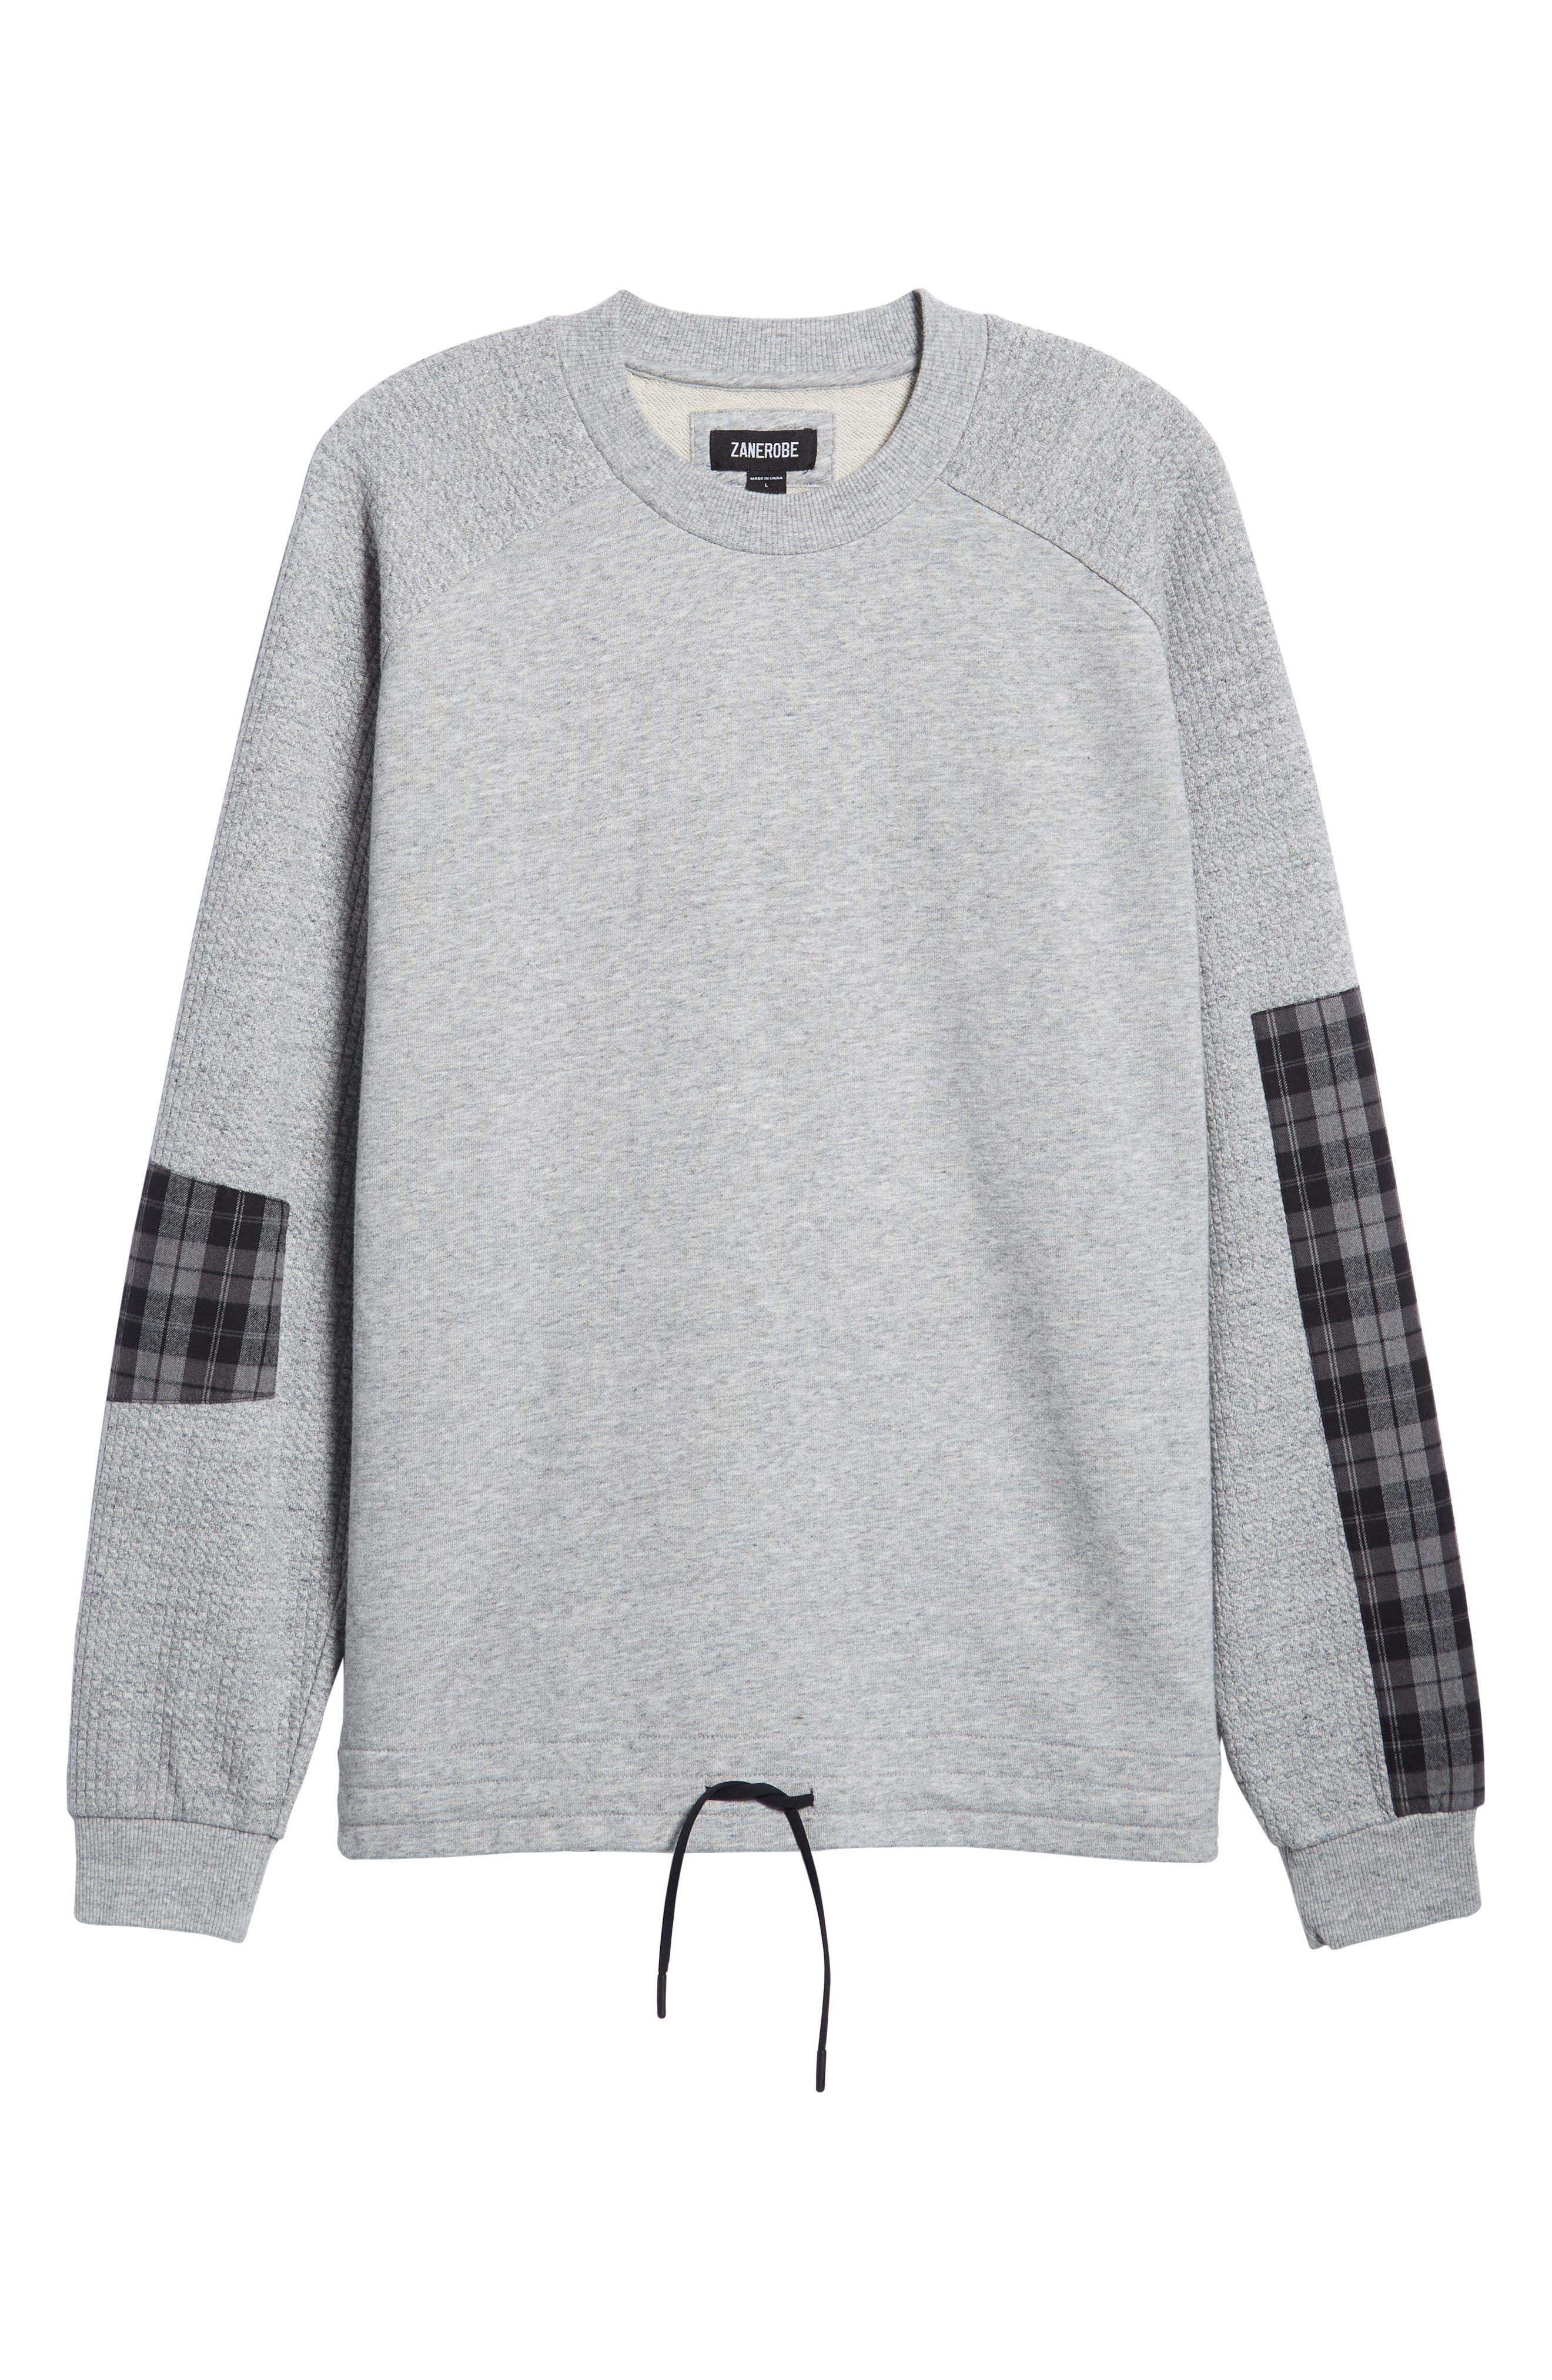 Media Rugger Sweatshirt,                             Alternate thumbnail 6, color,                             030